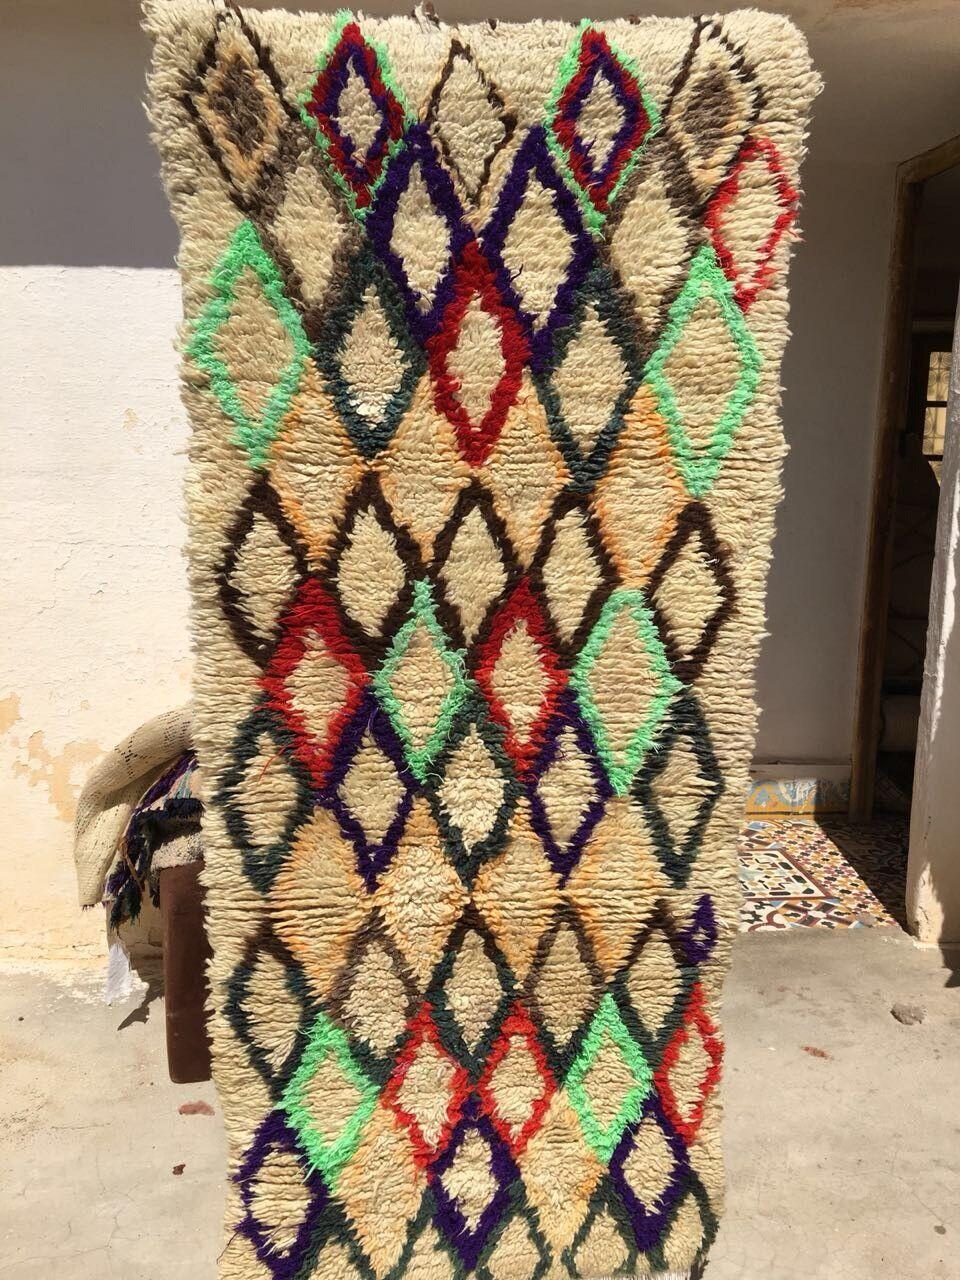 Vintage Moroccan Azilal Handmade Rug  M07 Wool Berber Tribal 5'5  x 2'2